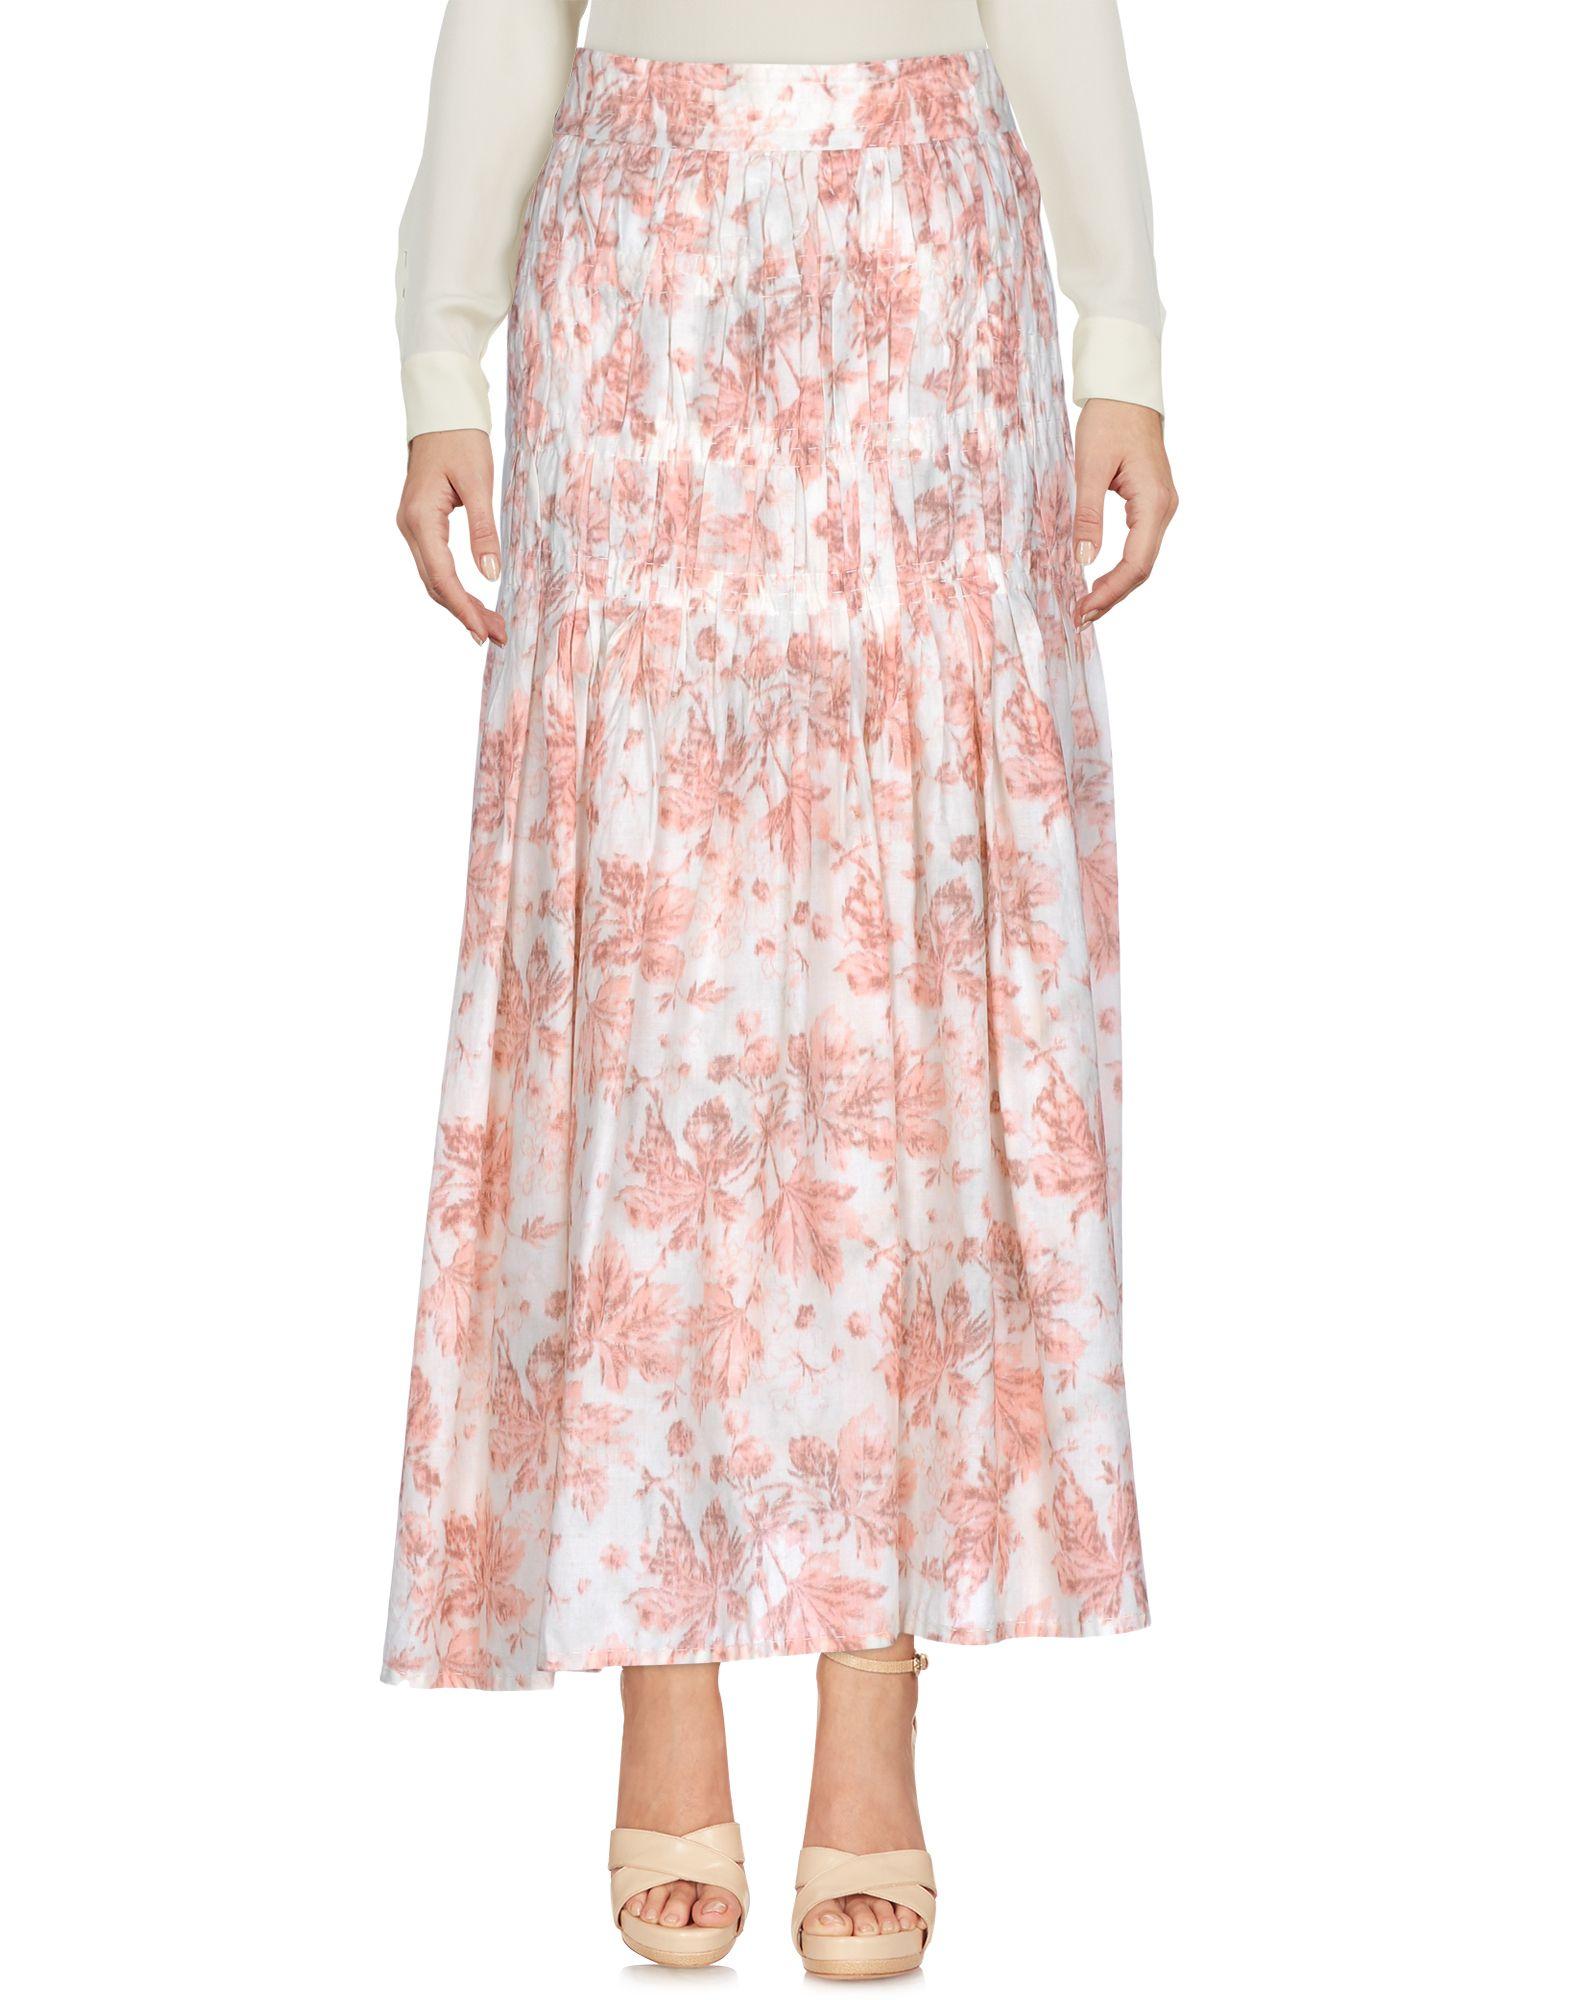 BROCK COLLECTION Юбка длиной 3/4 sh collection юбка длиной 3 4